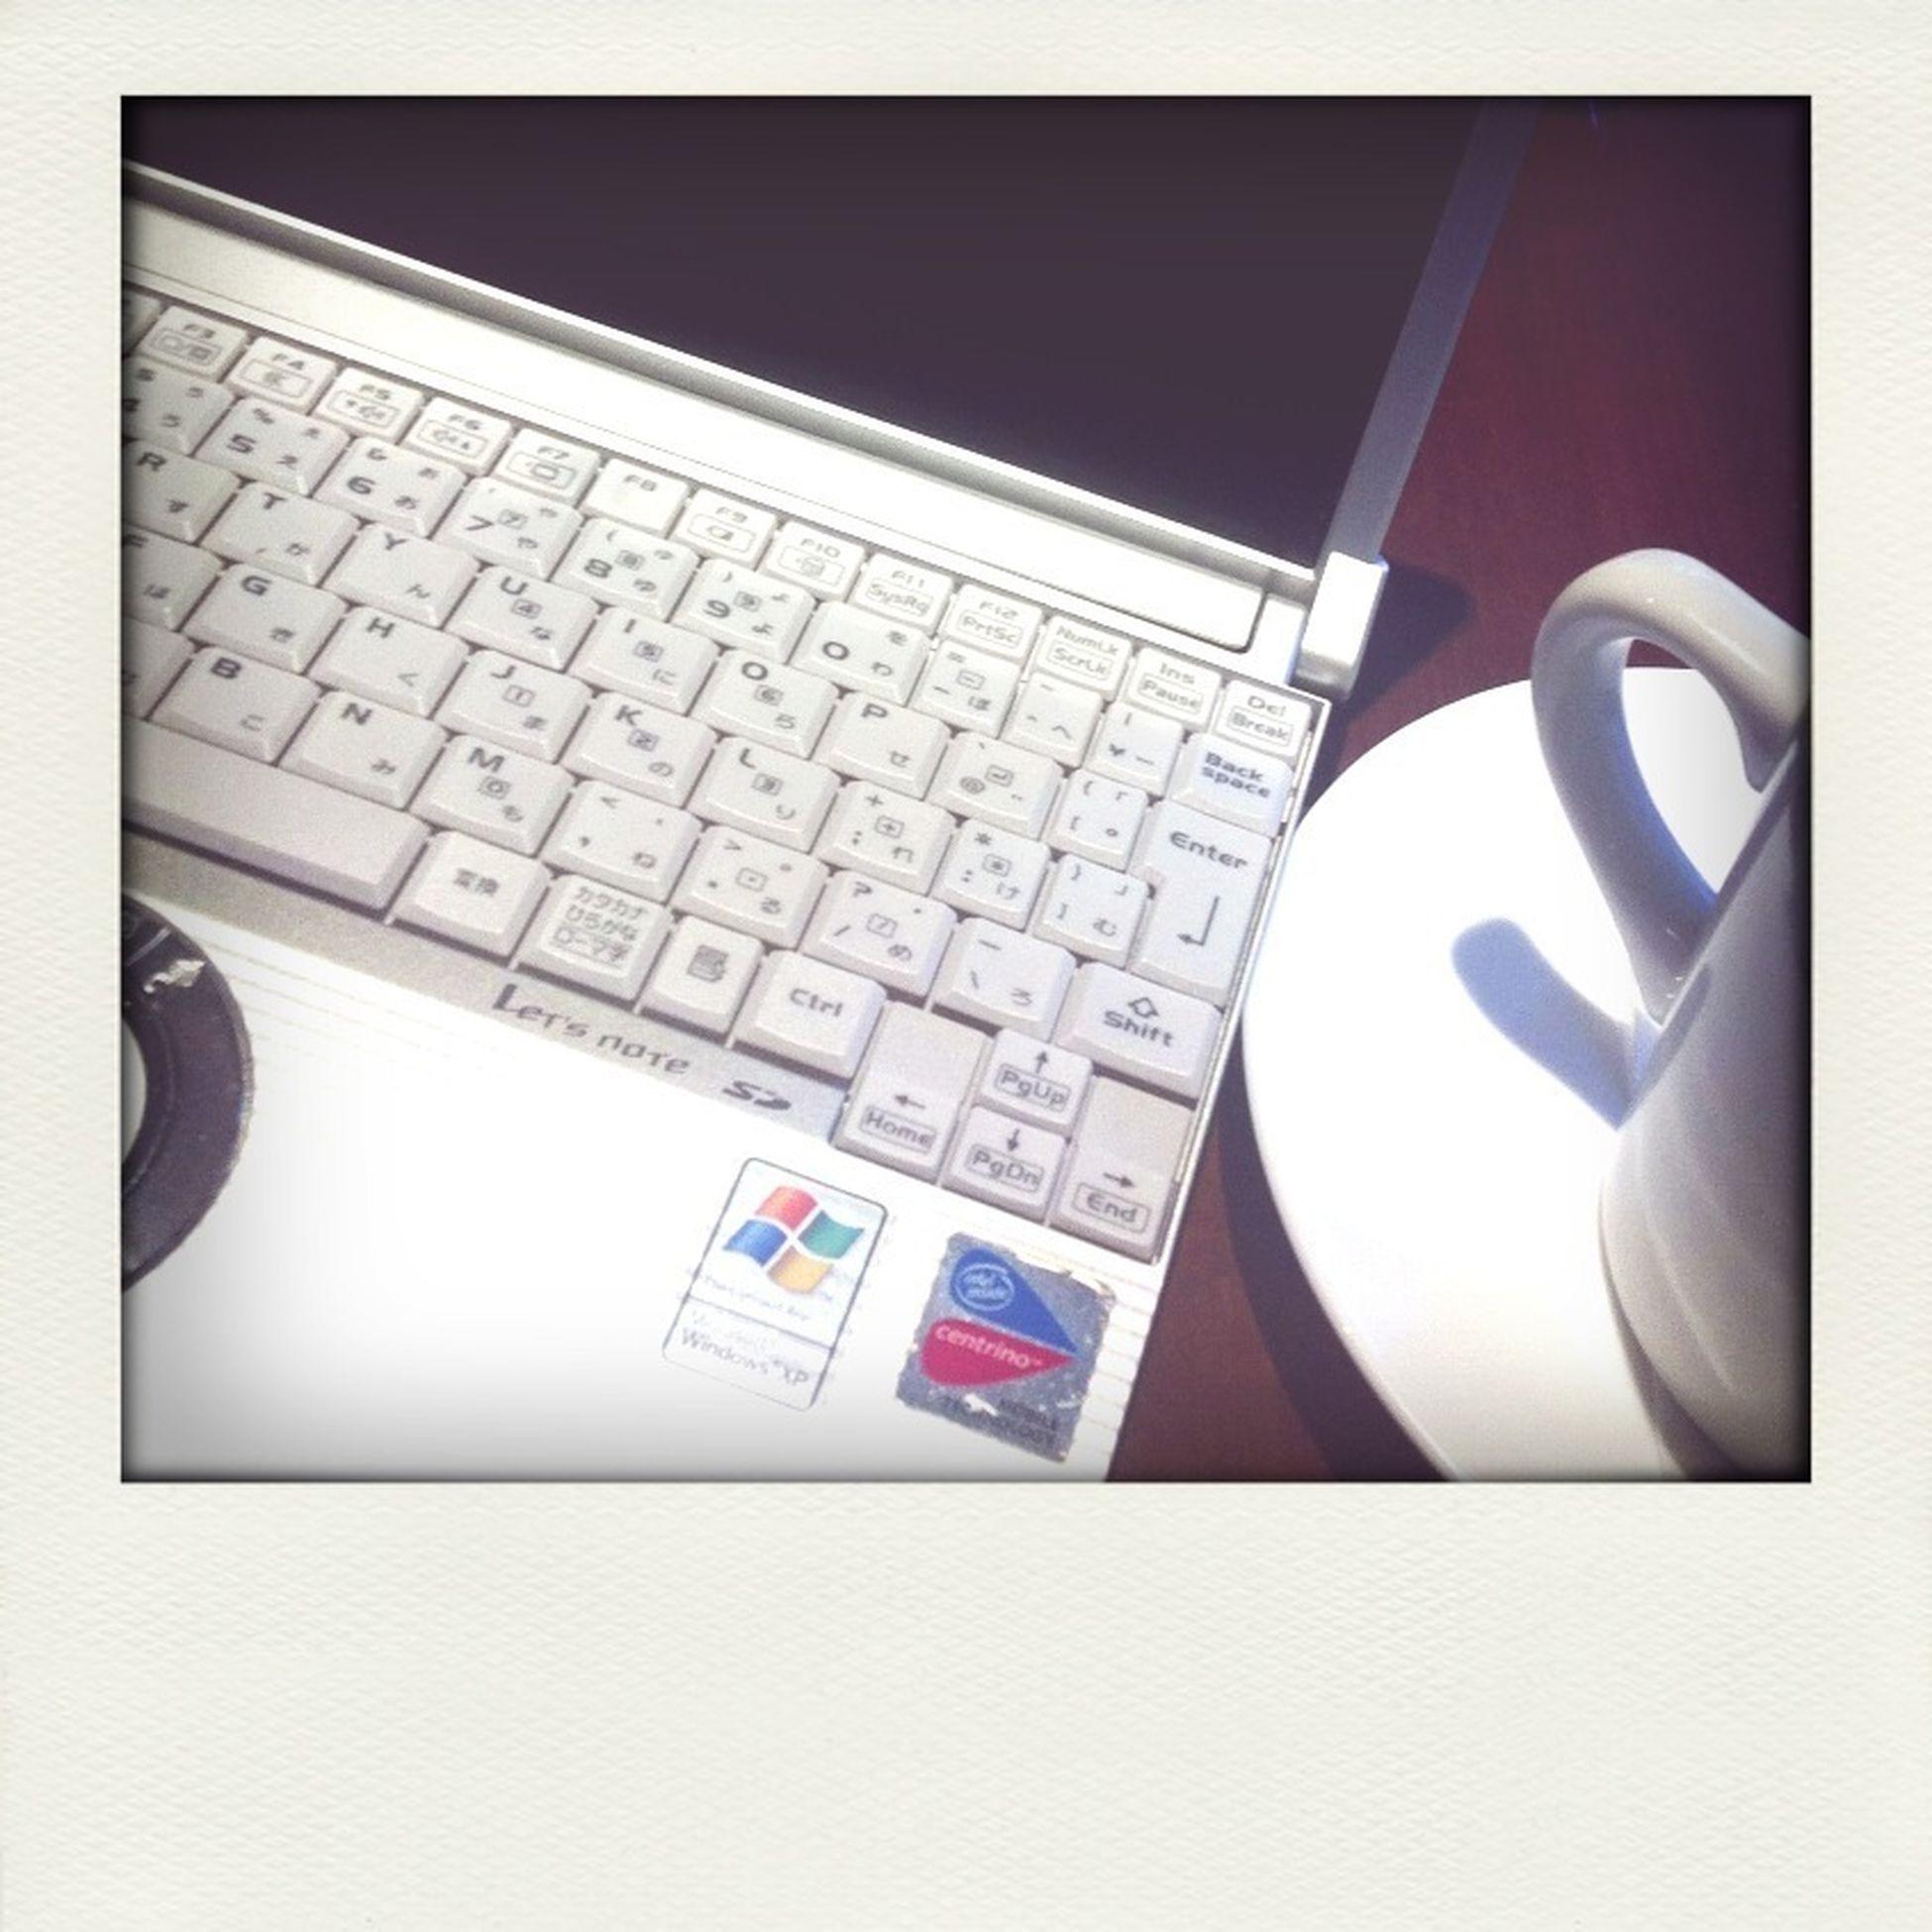 i got a new PC :)))